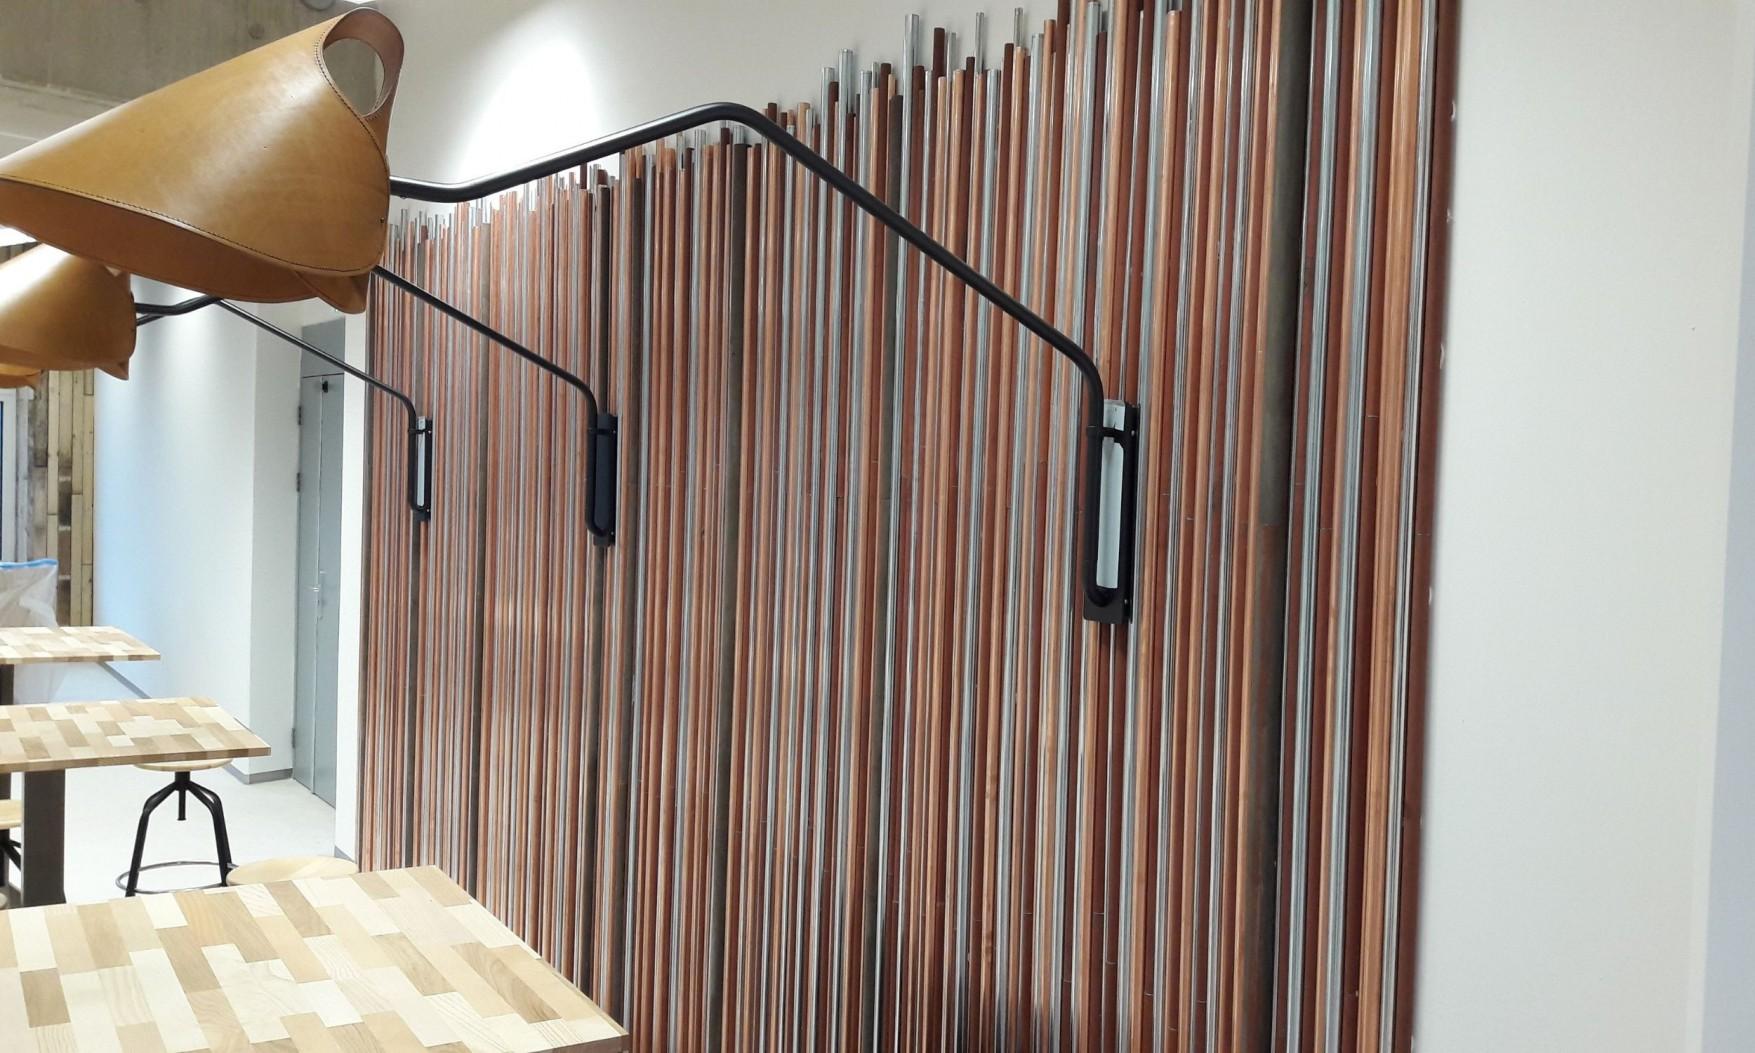 Harryvan Interierbouw | duurzame plafond en wandbekleding (Alliander Arnhem)